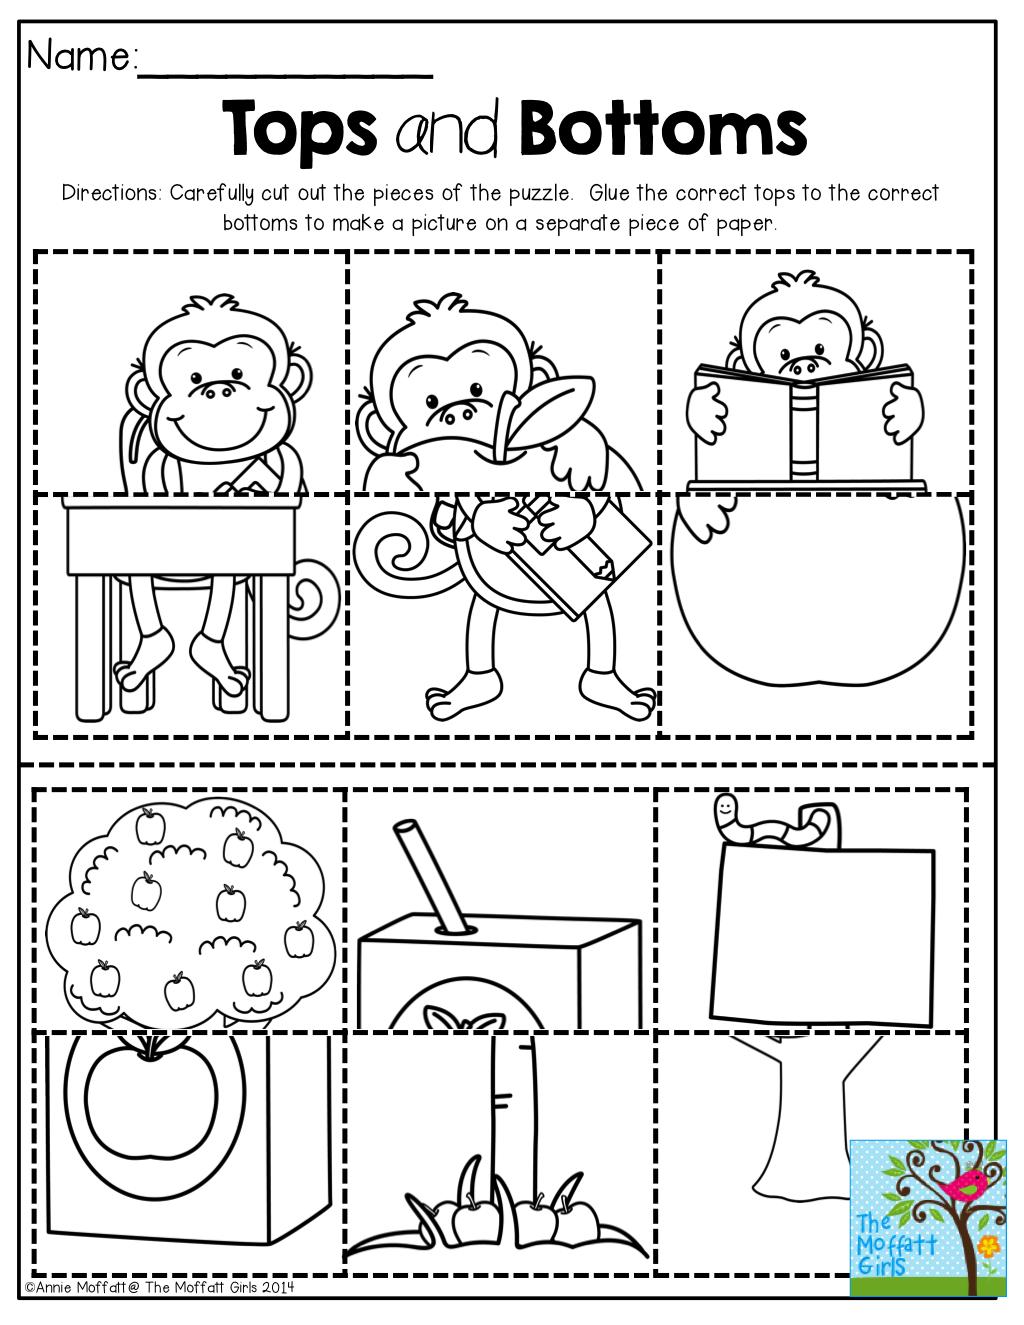 pin by marcia sheegog on bella learning tools preschool fine motor skills preschool. Black Bedroom Furniture Sets. Home Design Ideas